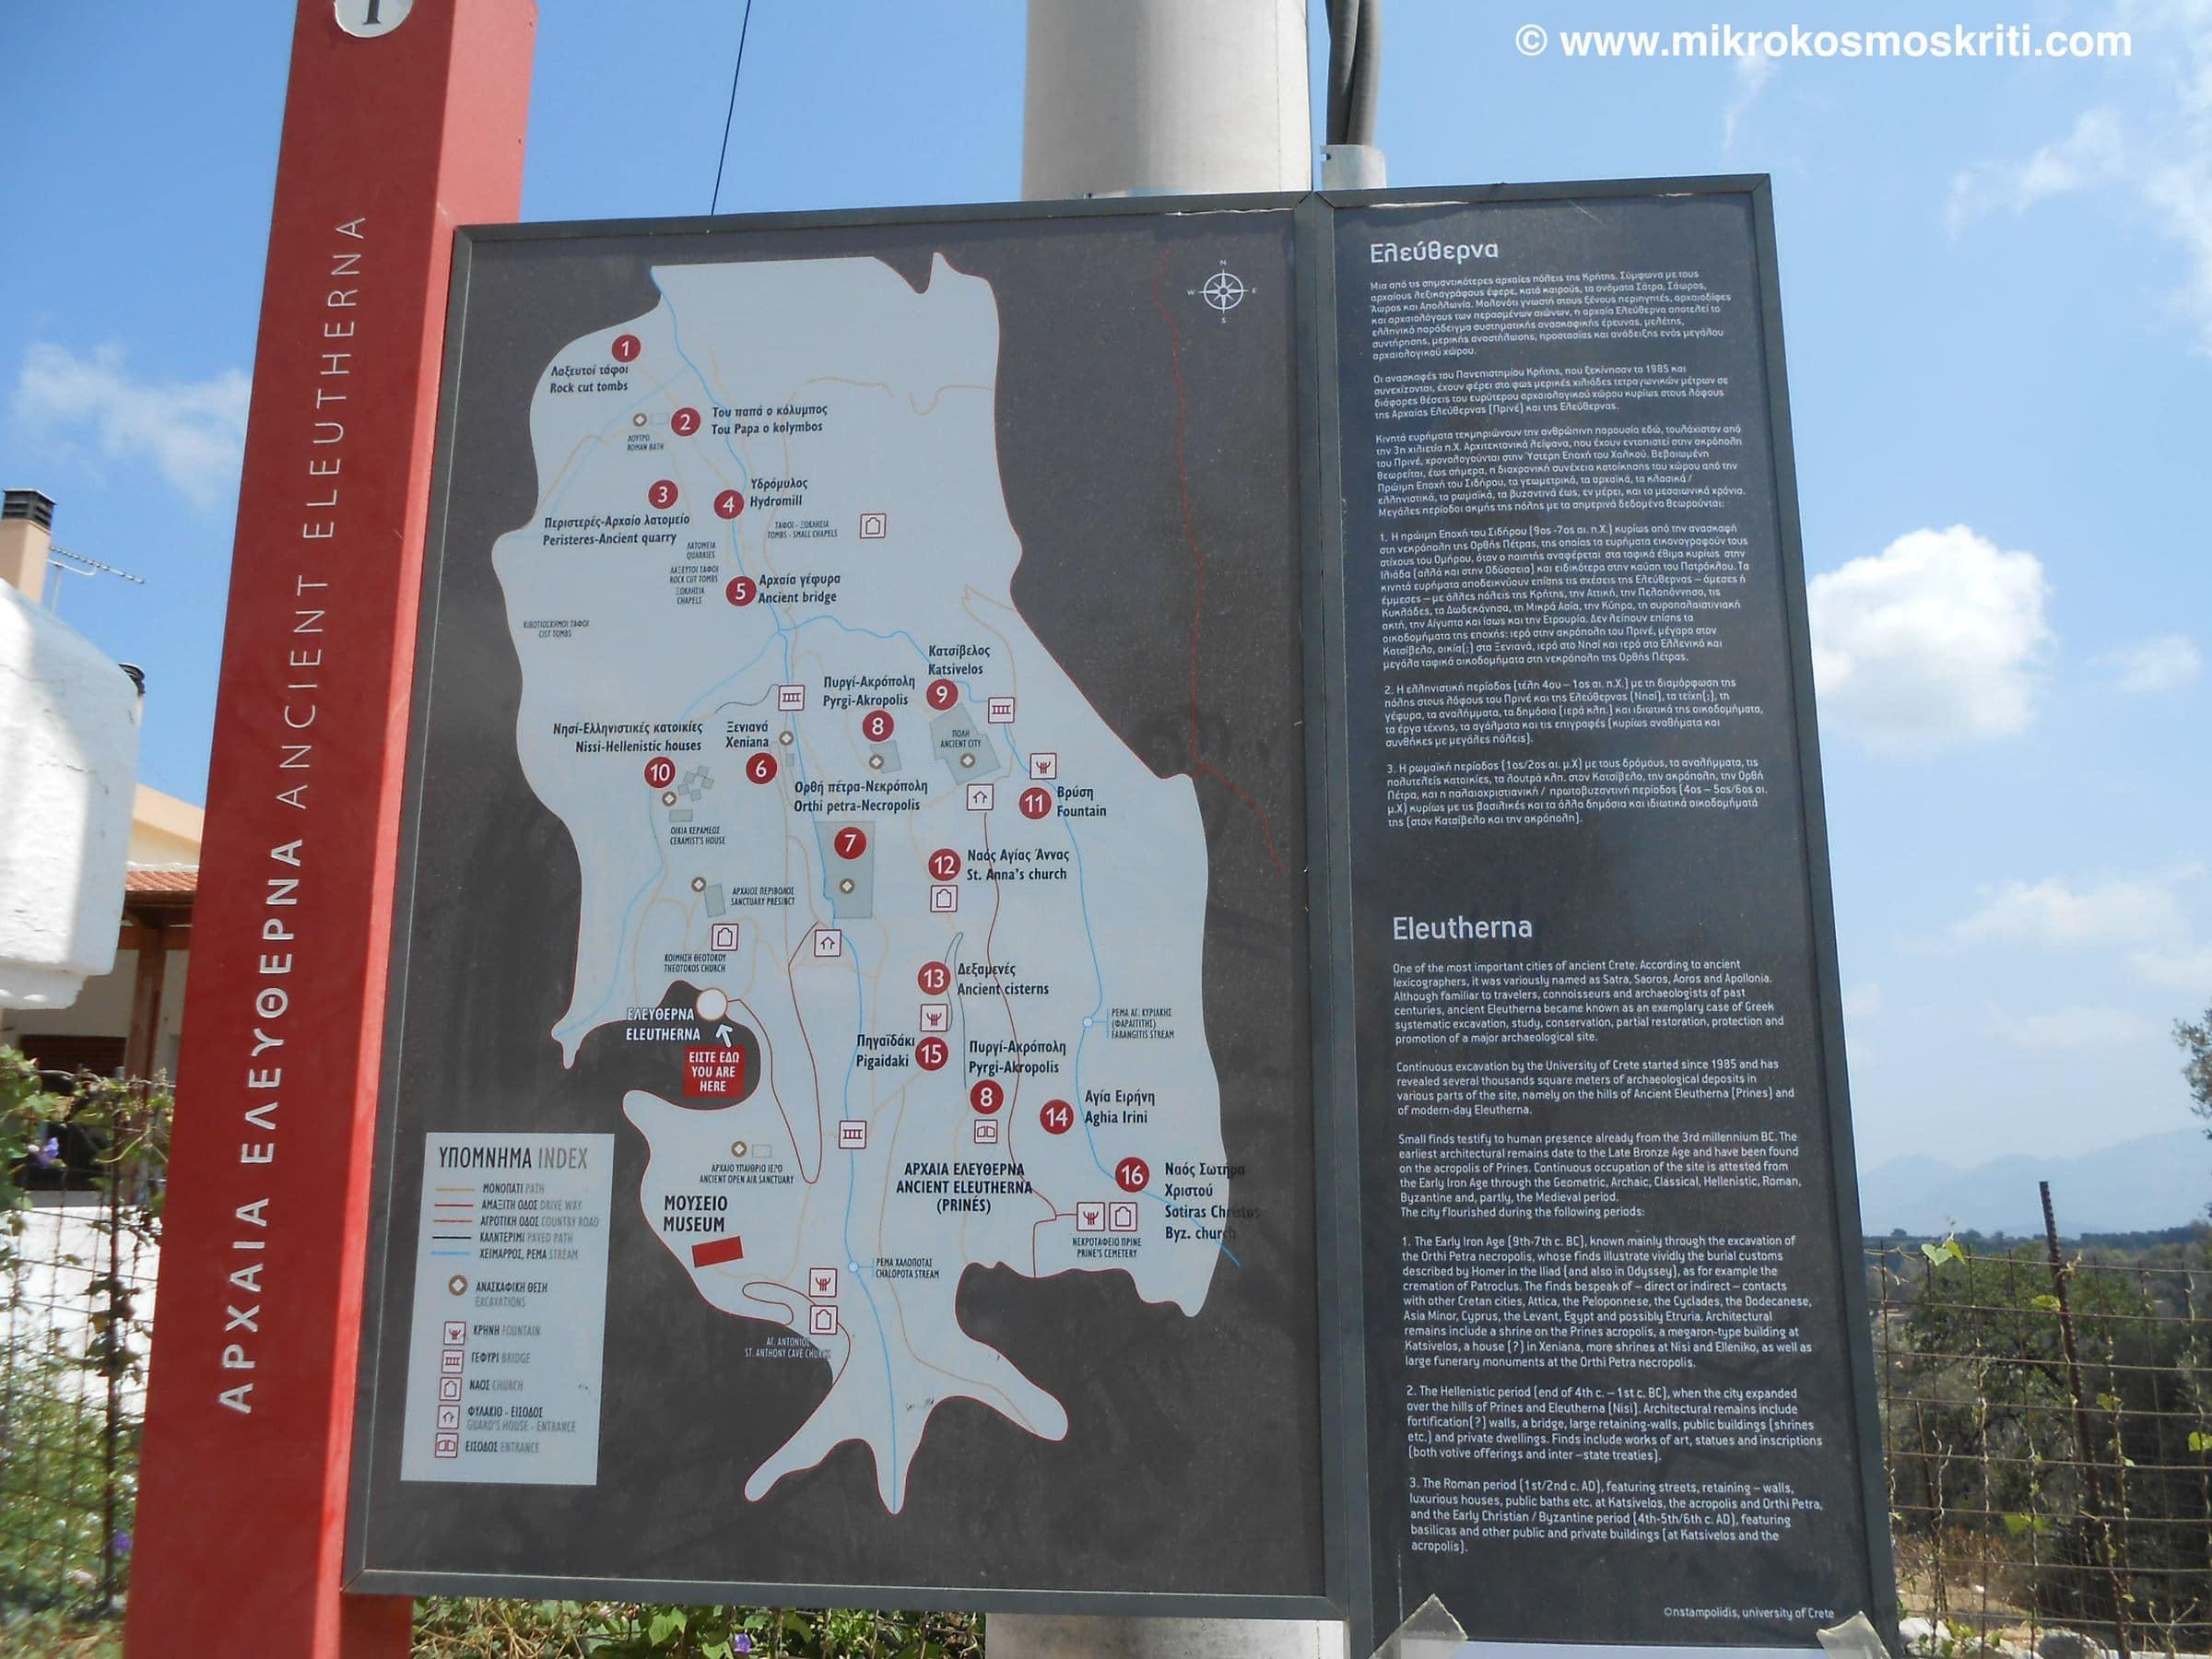 Mappa sito archeologico Eleftherna